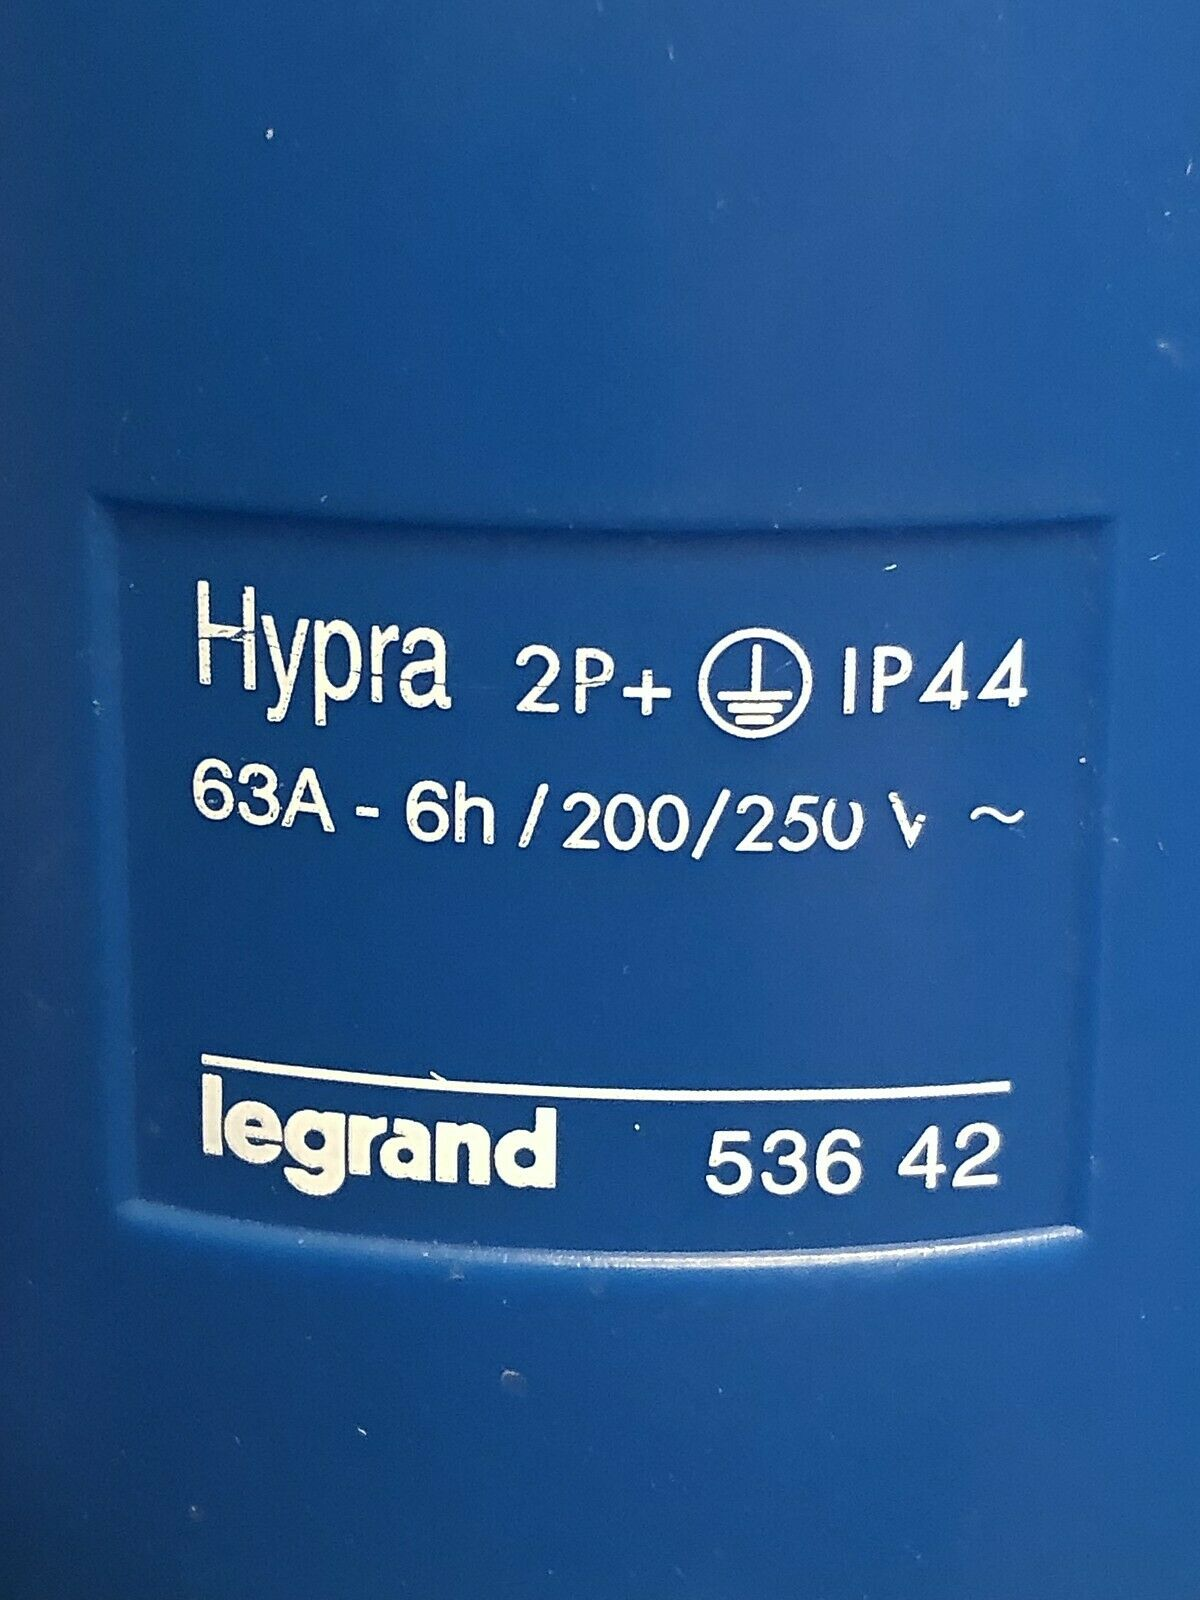 Legrand Hypra 536 42 53642 male pin /& sleeve plug connector 63 amp 250 volt